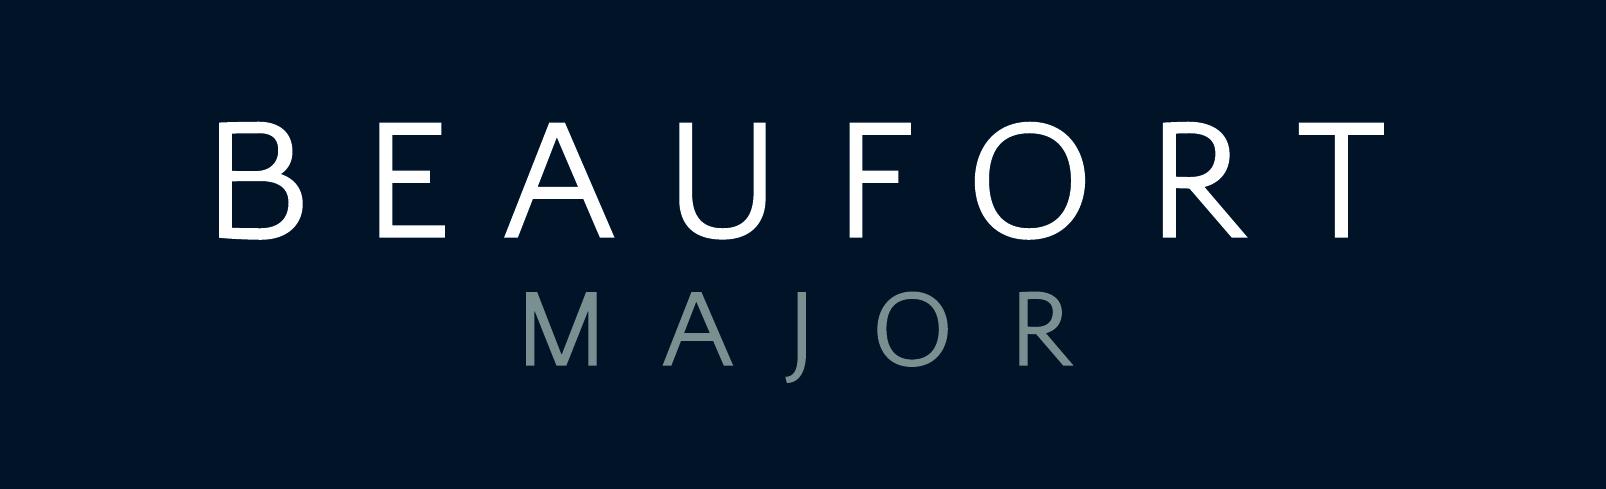 Beaufort Major Limited